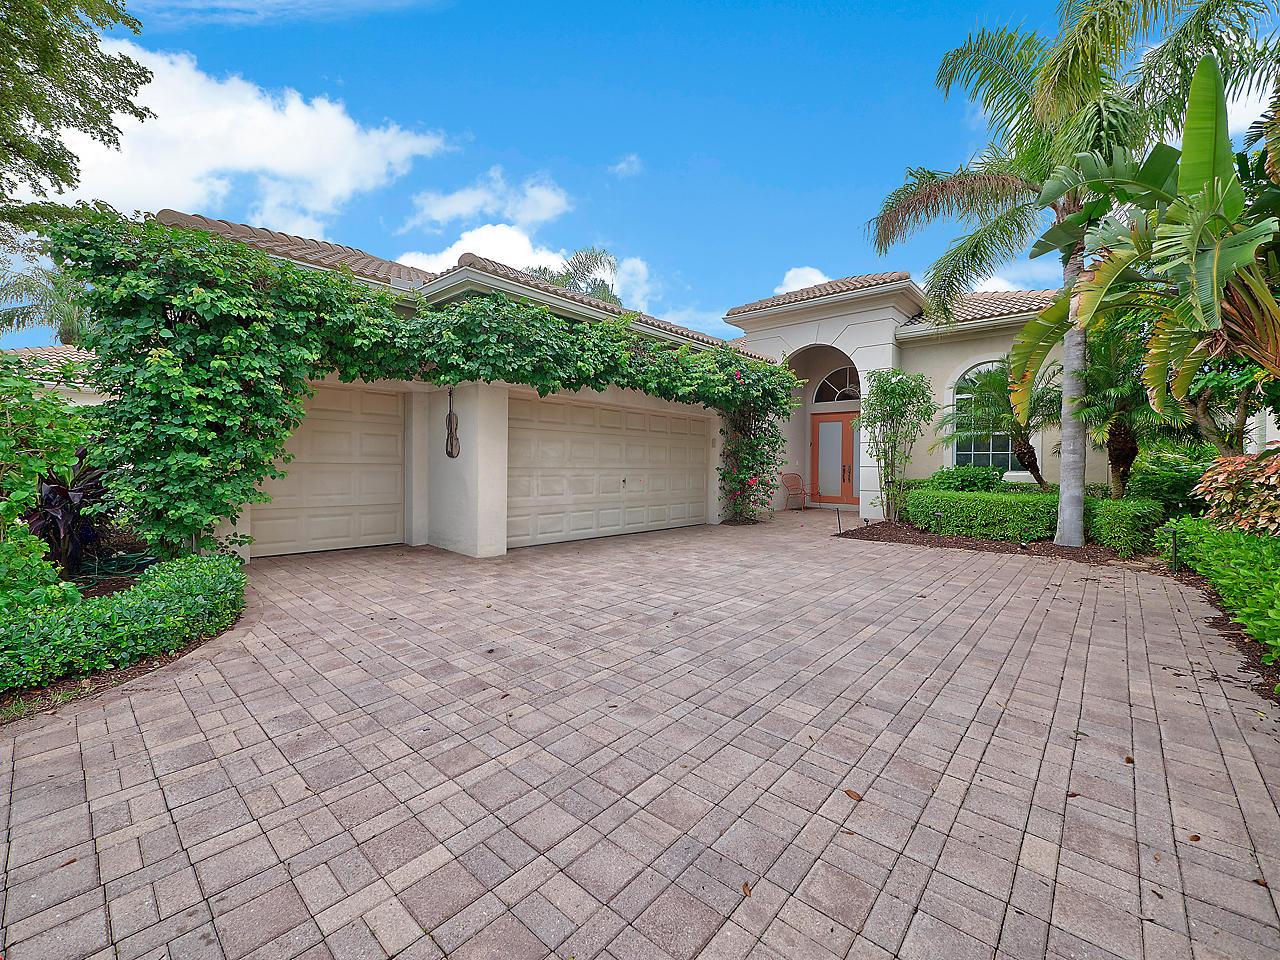 50 Laguna Terrace, Palm Beach Gardens, Florida 33418, 3 Bedrooms Bedrooms, ,3 BathroomsBathrooms,A,Single family,Laguna,RX-10381869